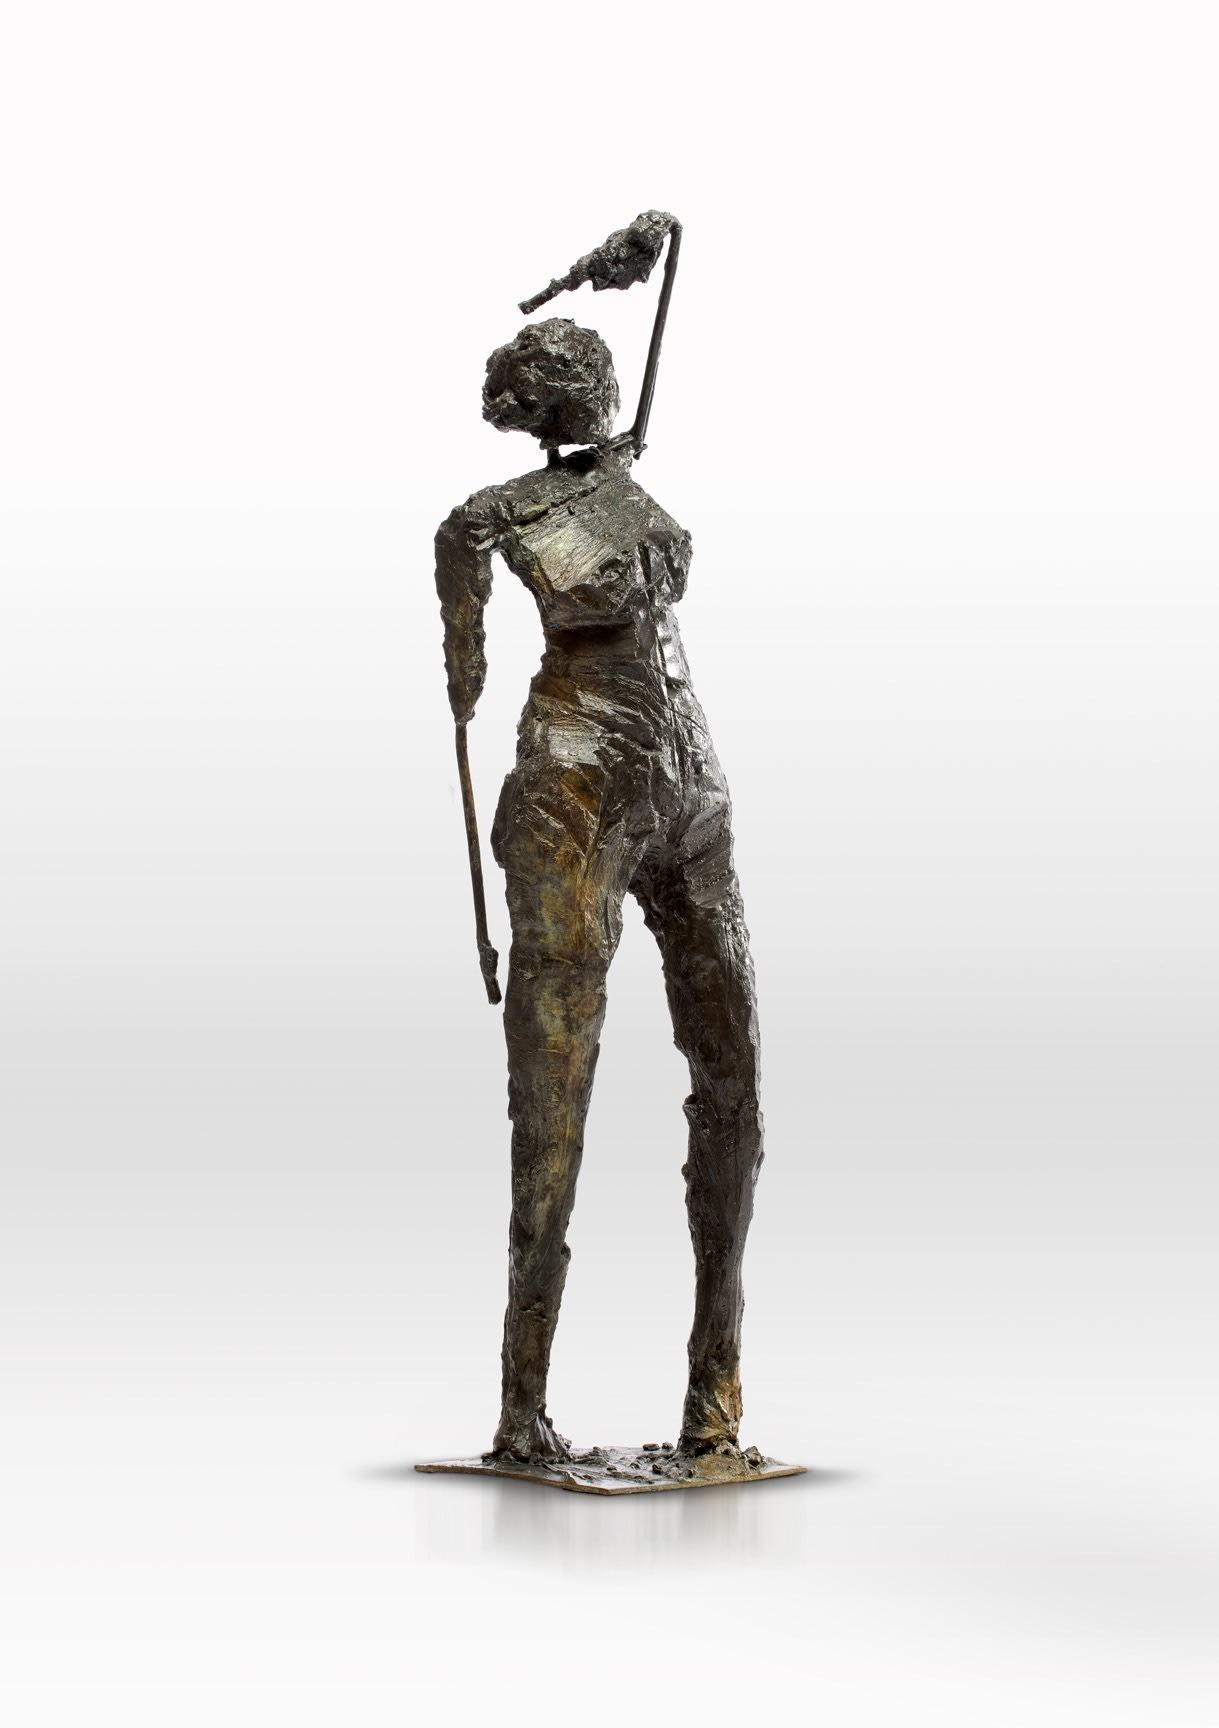 "<span class=""link fancybox-details-link""><a href=""/artworks/1671-emilio-diiorio-reaction-2014/"">View Detail Page</a></span><div class=""artist""><strong>Emilio DiIorio</strong></div> <div class=""title""><em>Reaction</em>, 2014</div> <div class=""medium"">bronze</div> <div class=""dimensions"">52"" x 10"" x 8""</div><div class=""copyright_line"">Copyright The Artist</div>"